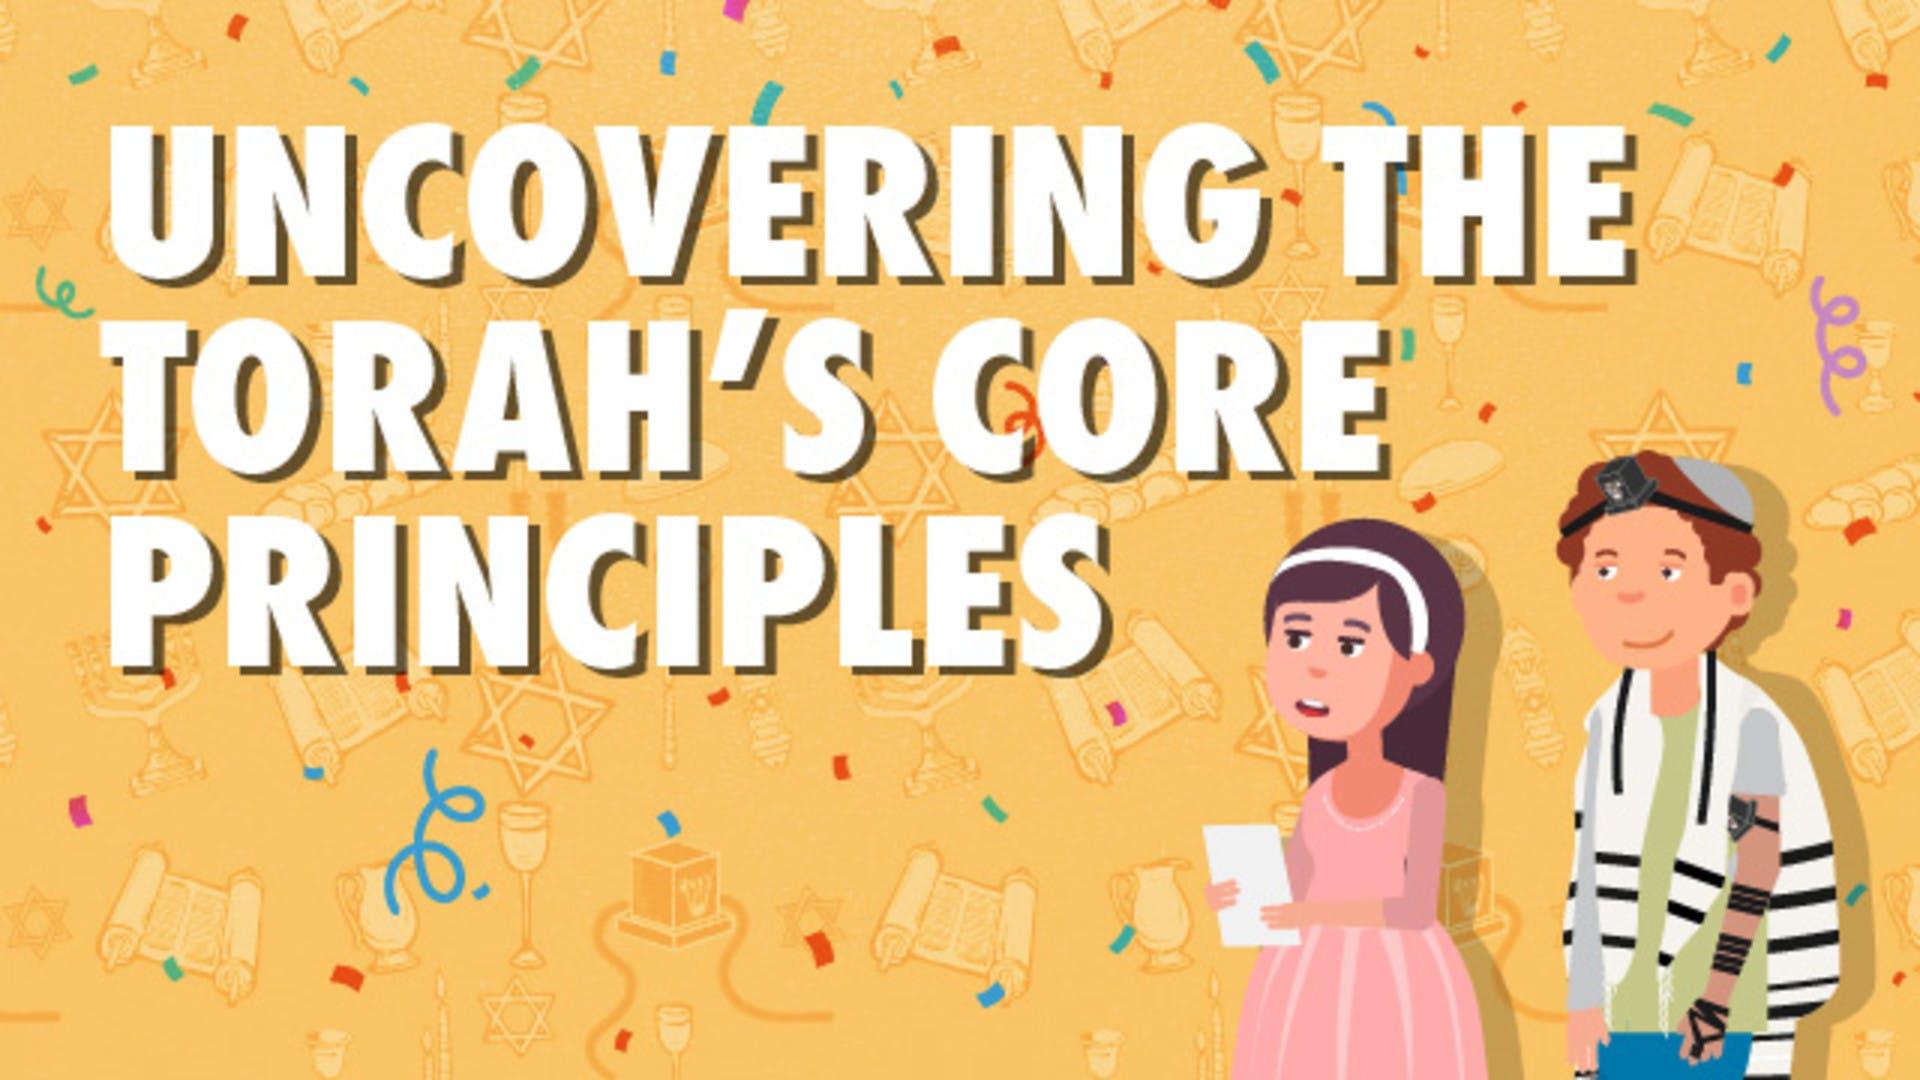 Uncovering the Torah's Core Principles